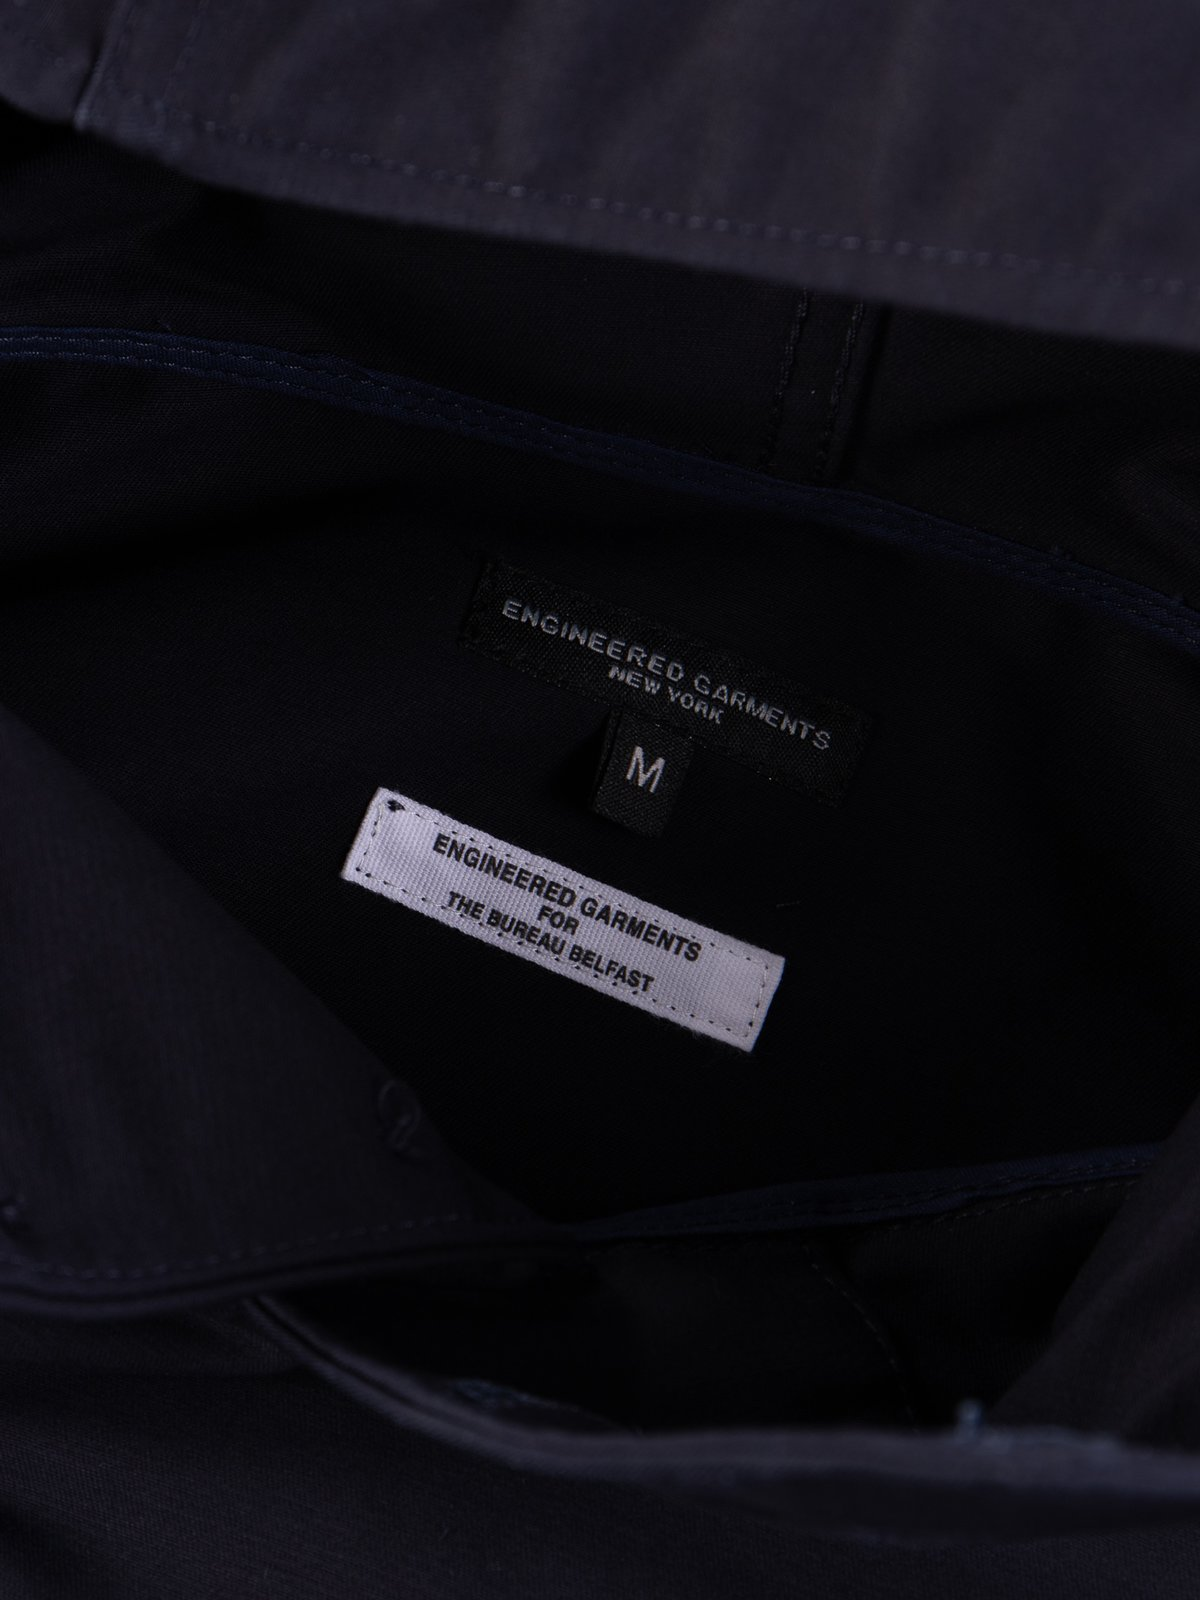 Navy Cotton Double Cloth Cagoule Shirt - Image 6